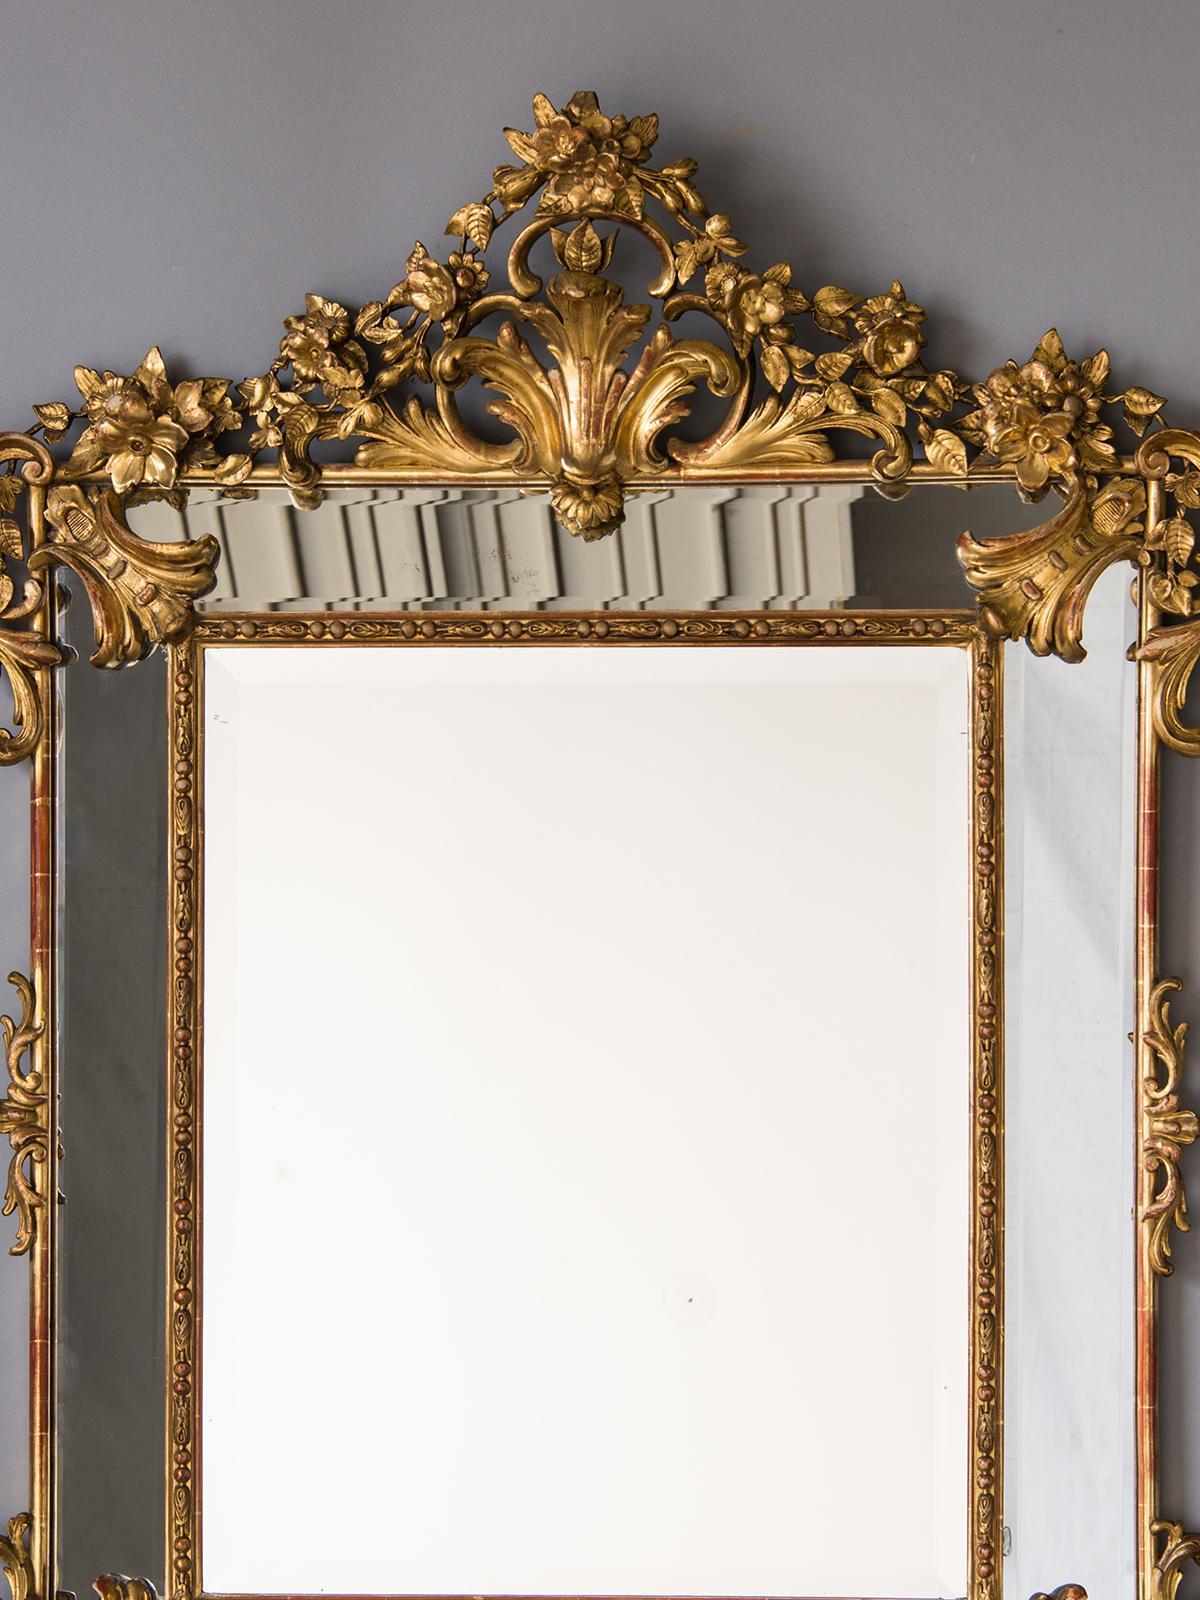 Luxury 19th Century Bold Antique French Regence Style Pareclose Gold